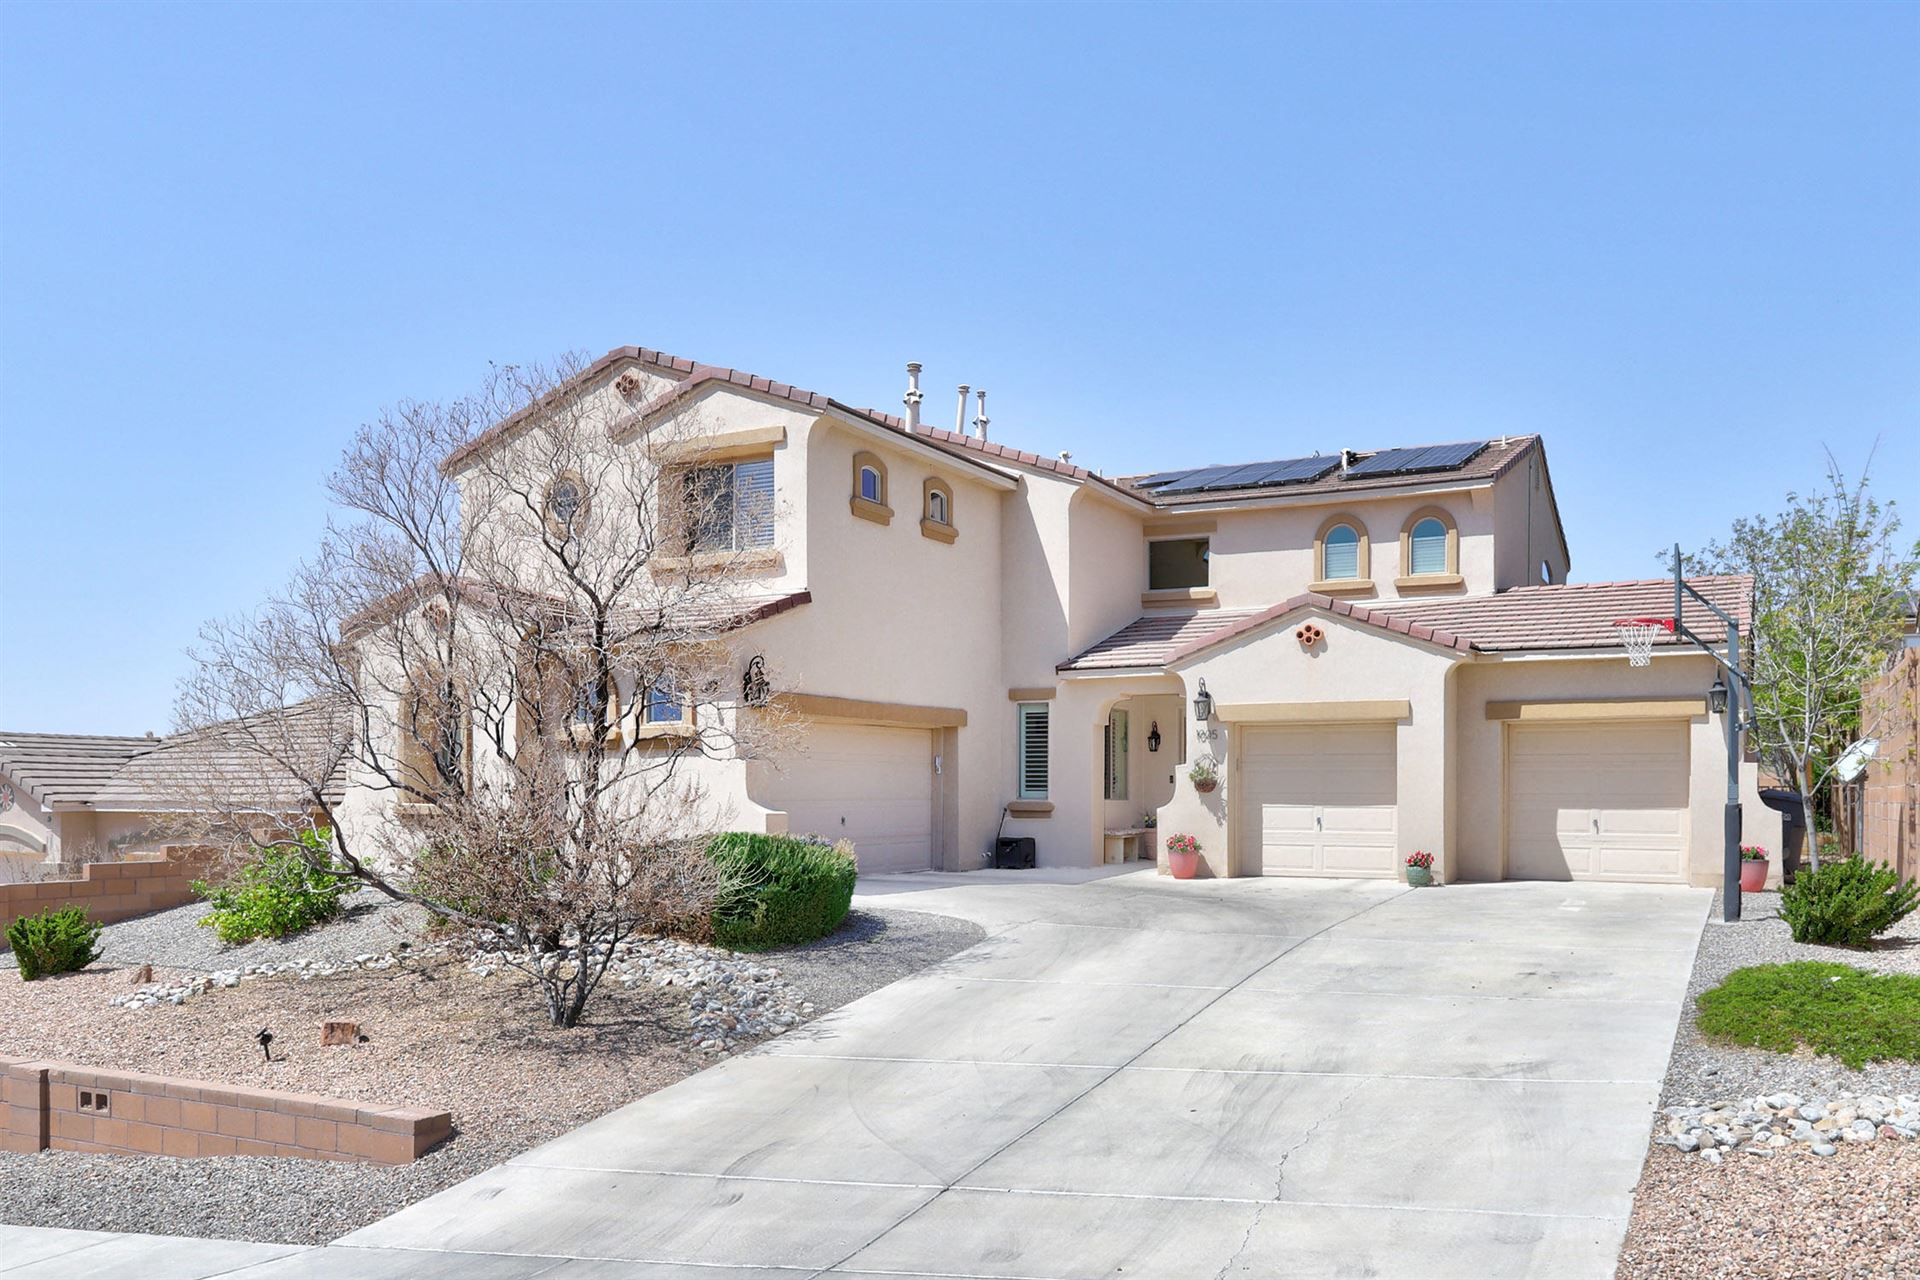 Photo of 1005 Rockaway Boulevard NE, Rio Rancho, NM 87144 (MLS # 989901)